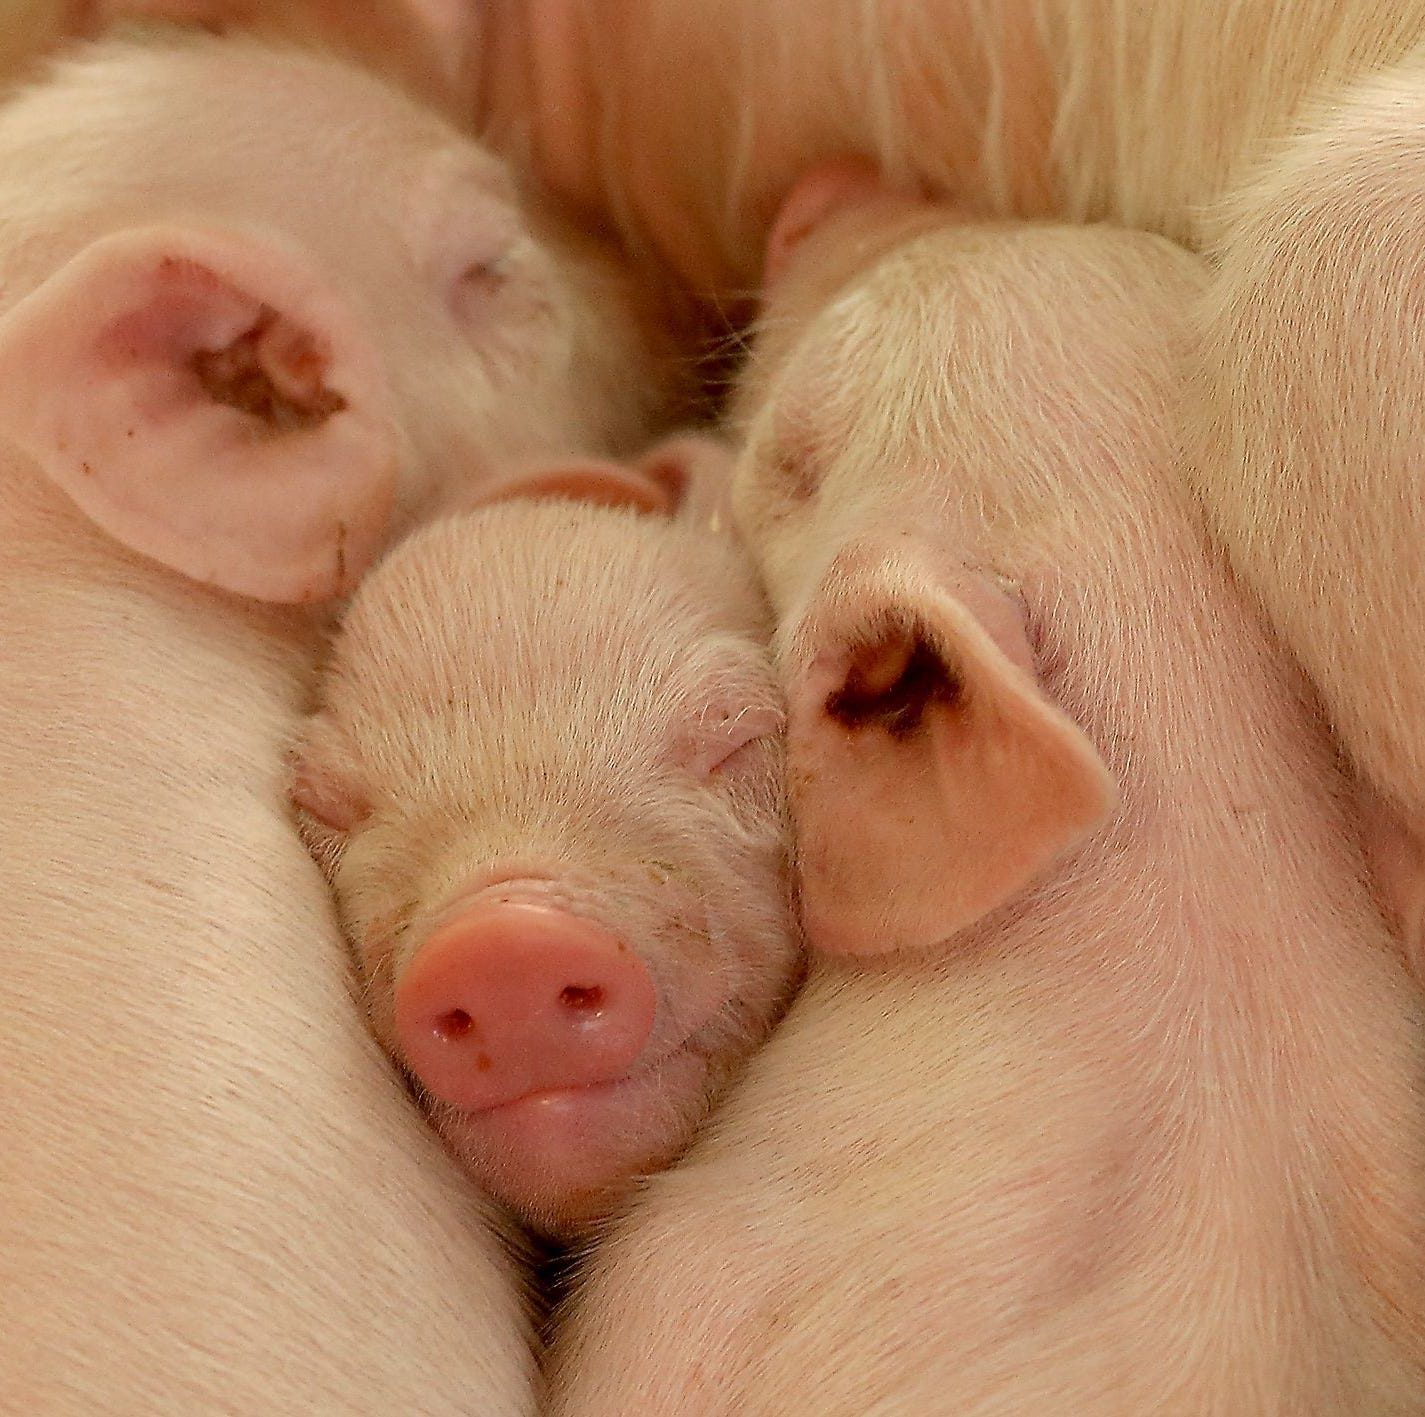 Officials seize 1M lbs.of pork amid virus concerns